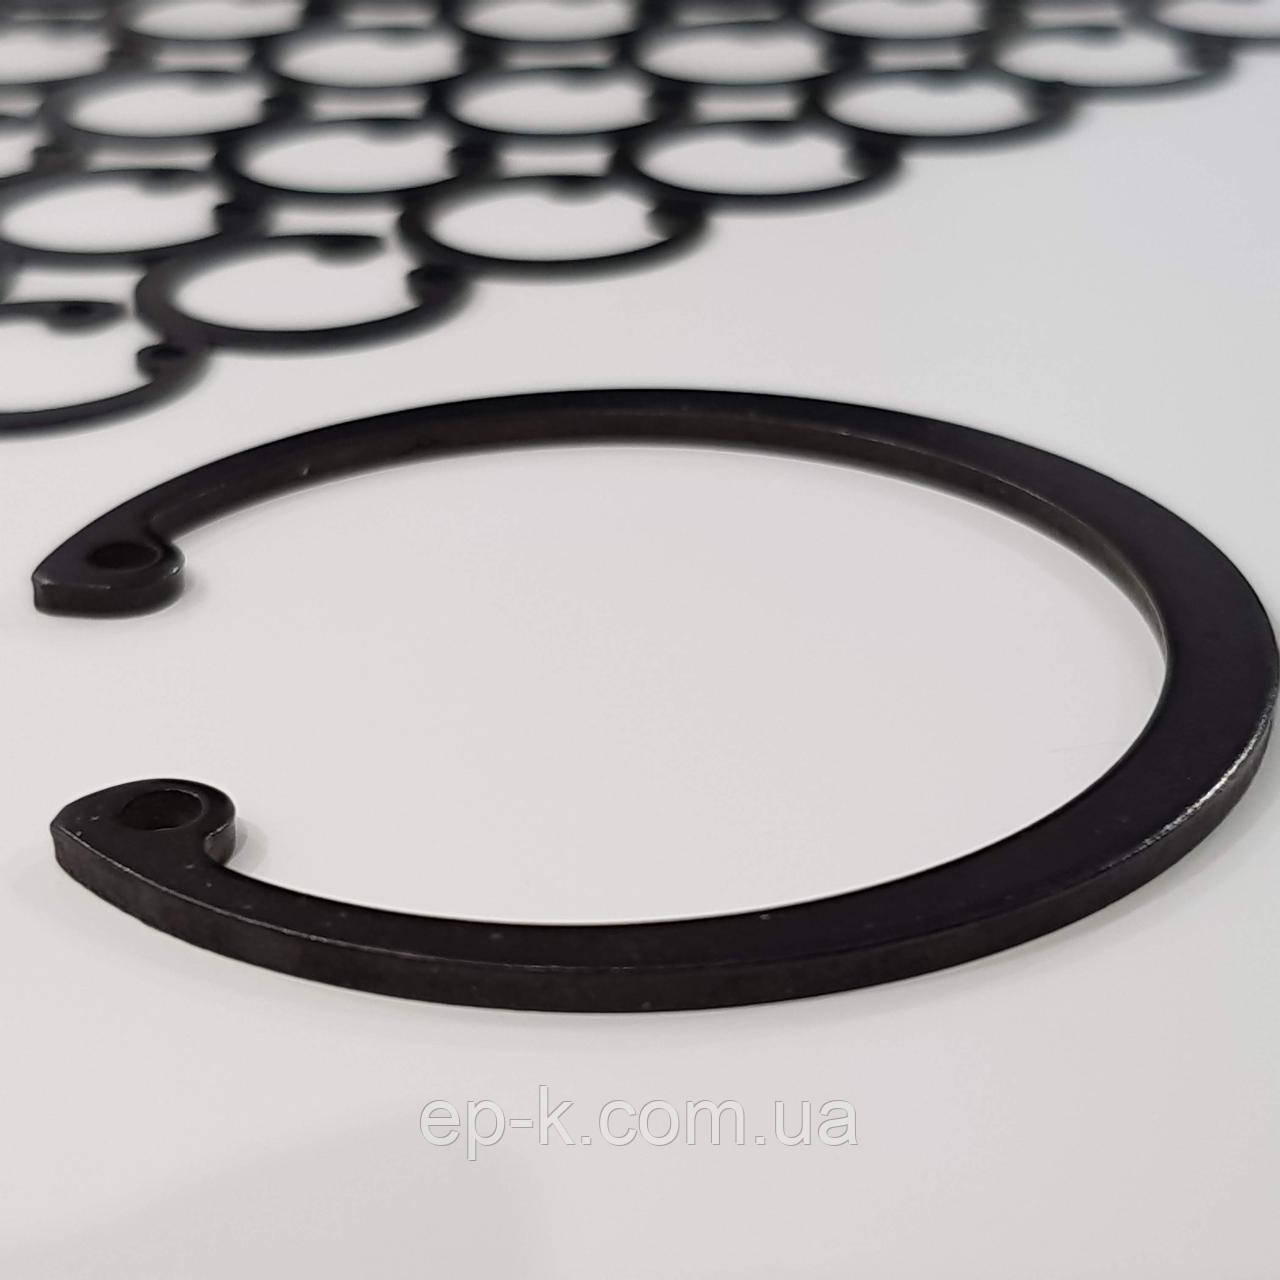 Стопорное кольцо внутреннее А190  ГОСТ 13943-86, DIN 472